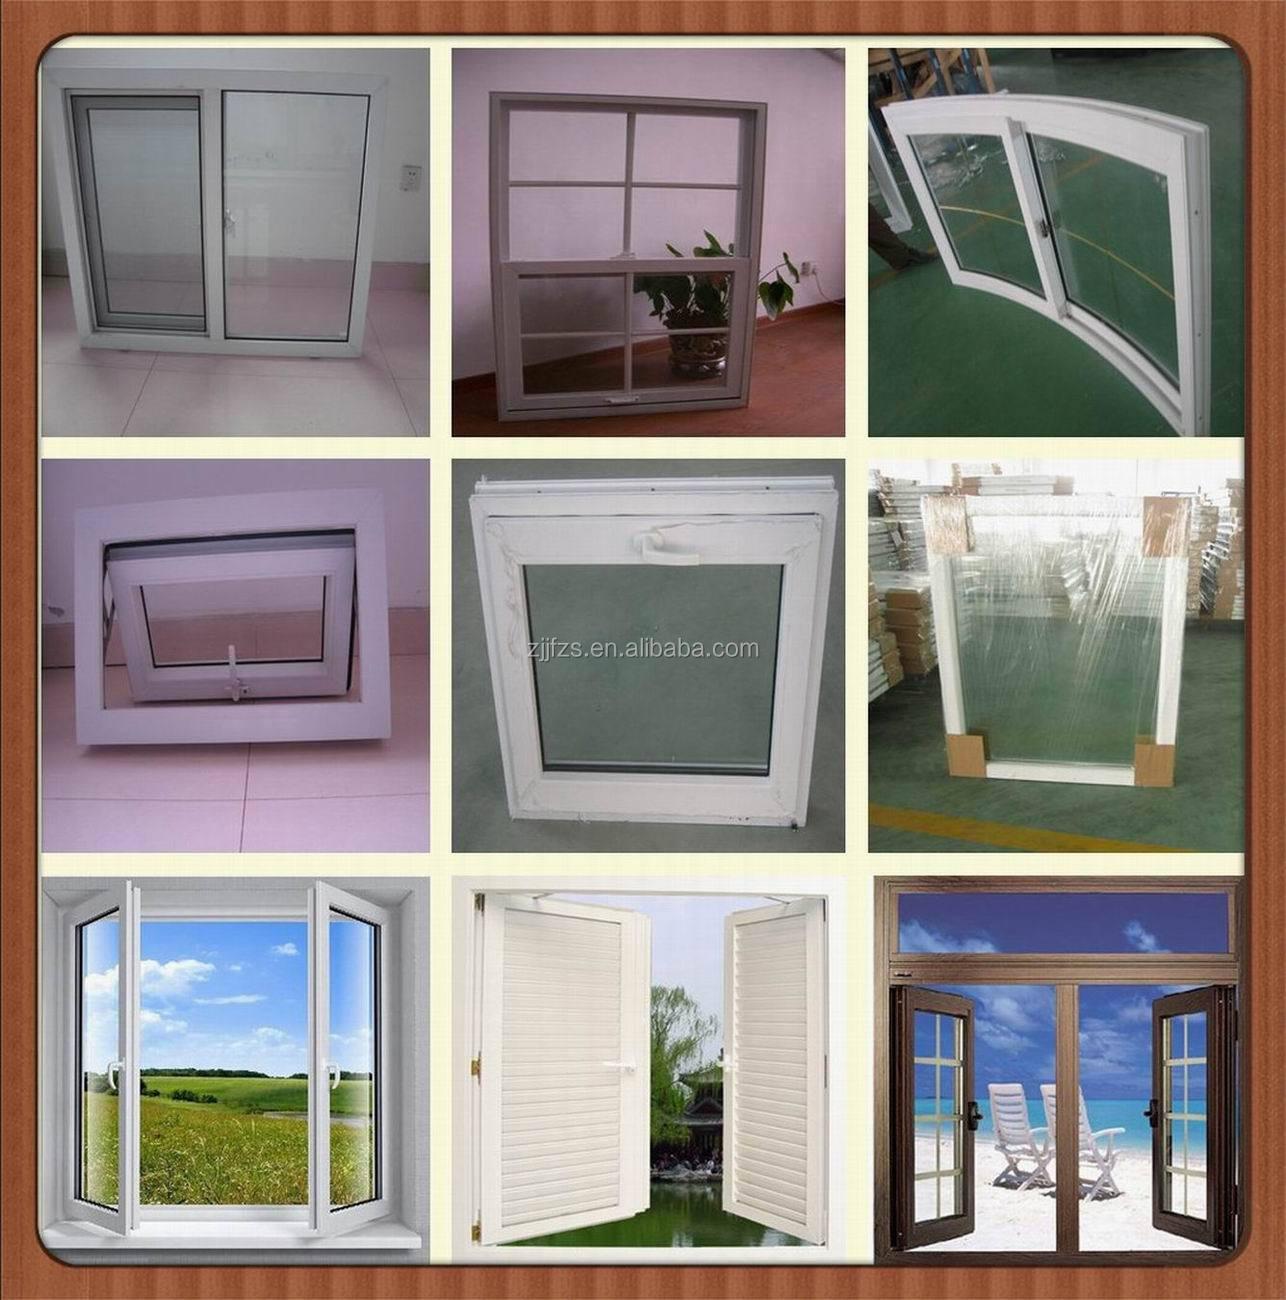 upvc casement windows house designs design of windows for houses rh alibaba com